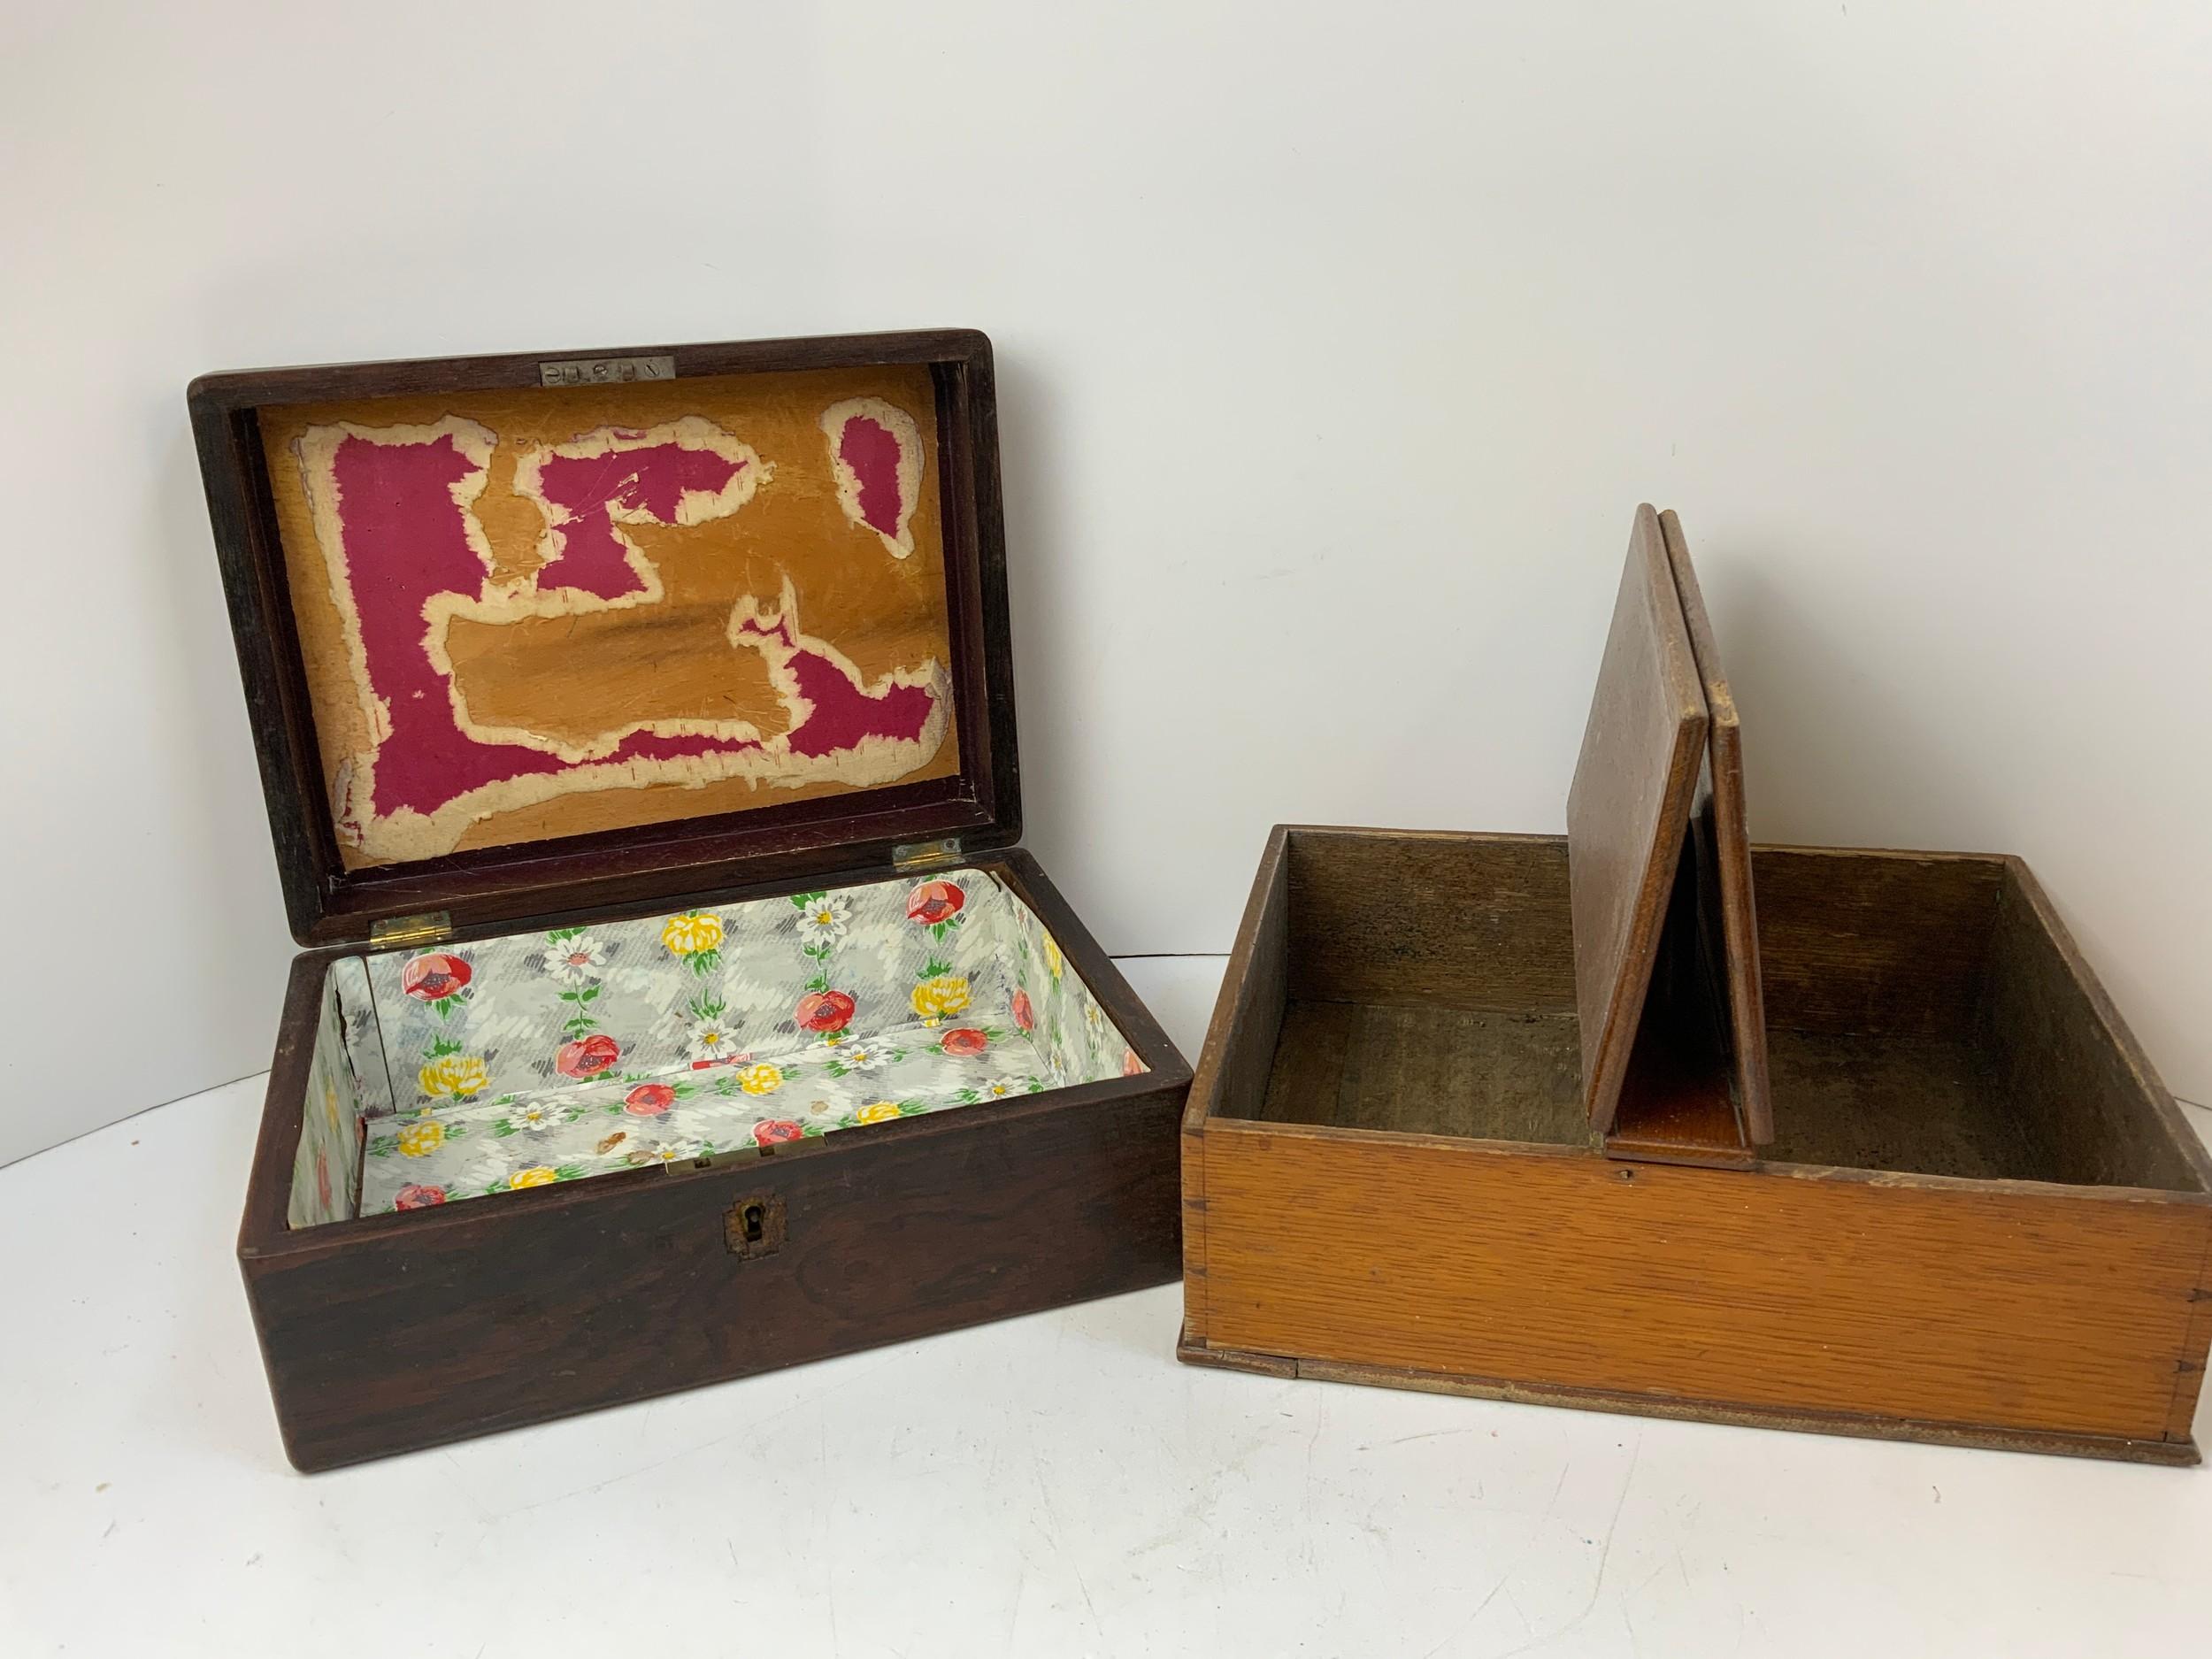 Oak Cutlery Box, Brass Bound Trinket Box and Ebony Writing Box for Restoration - Image 2 of 3